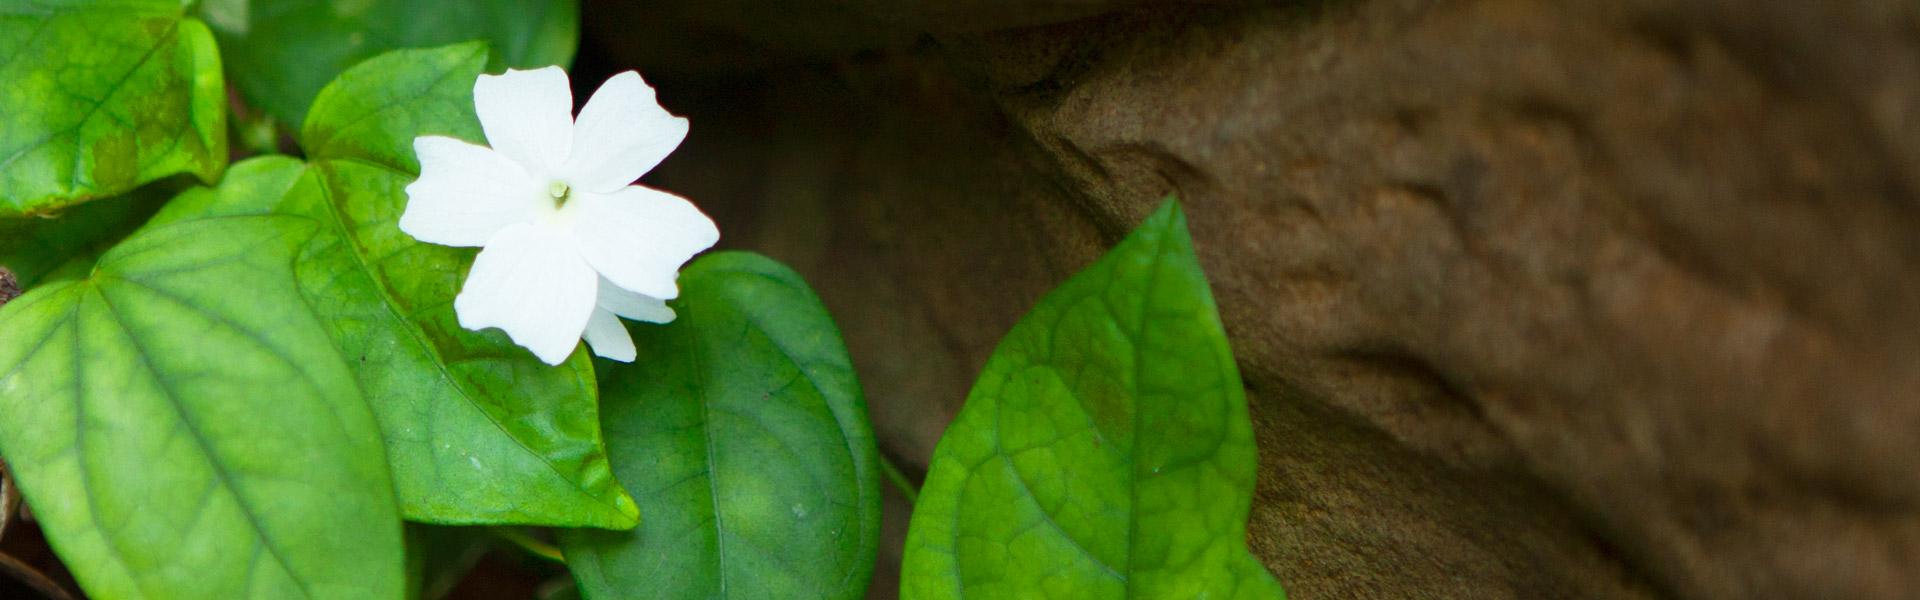 ss_whiteflower_1920618